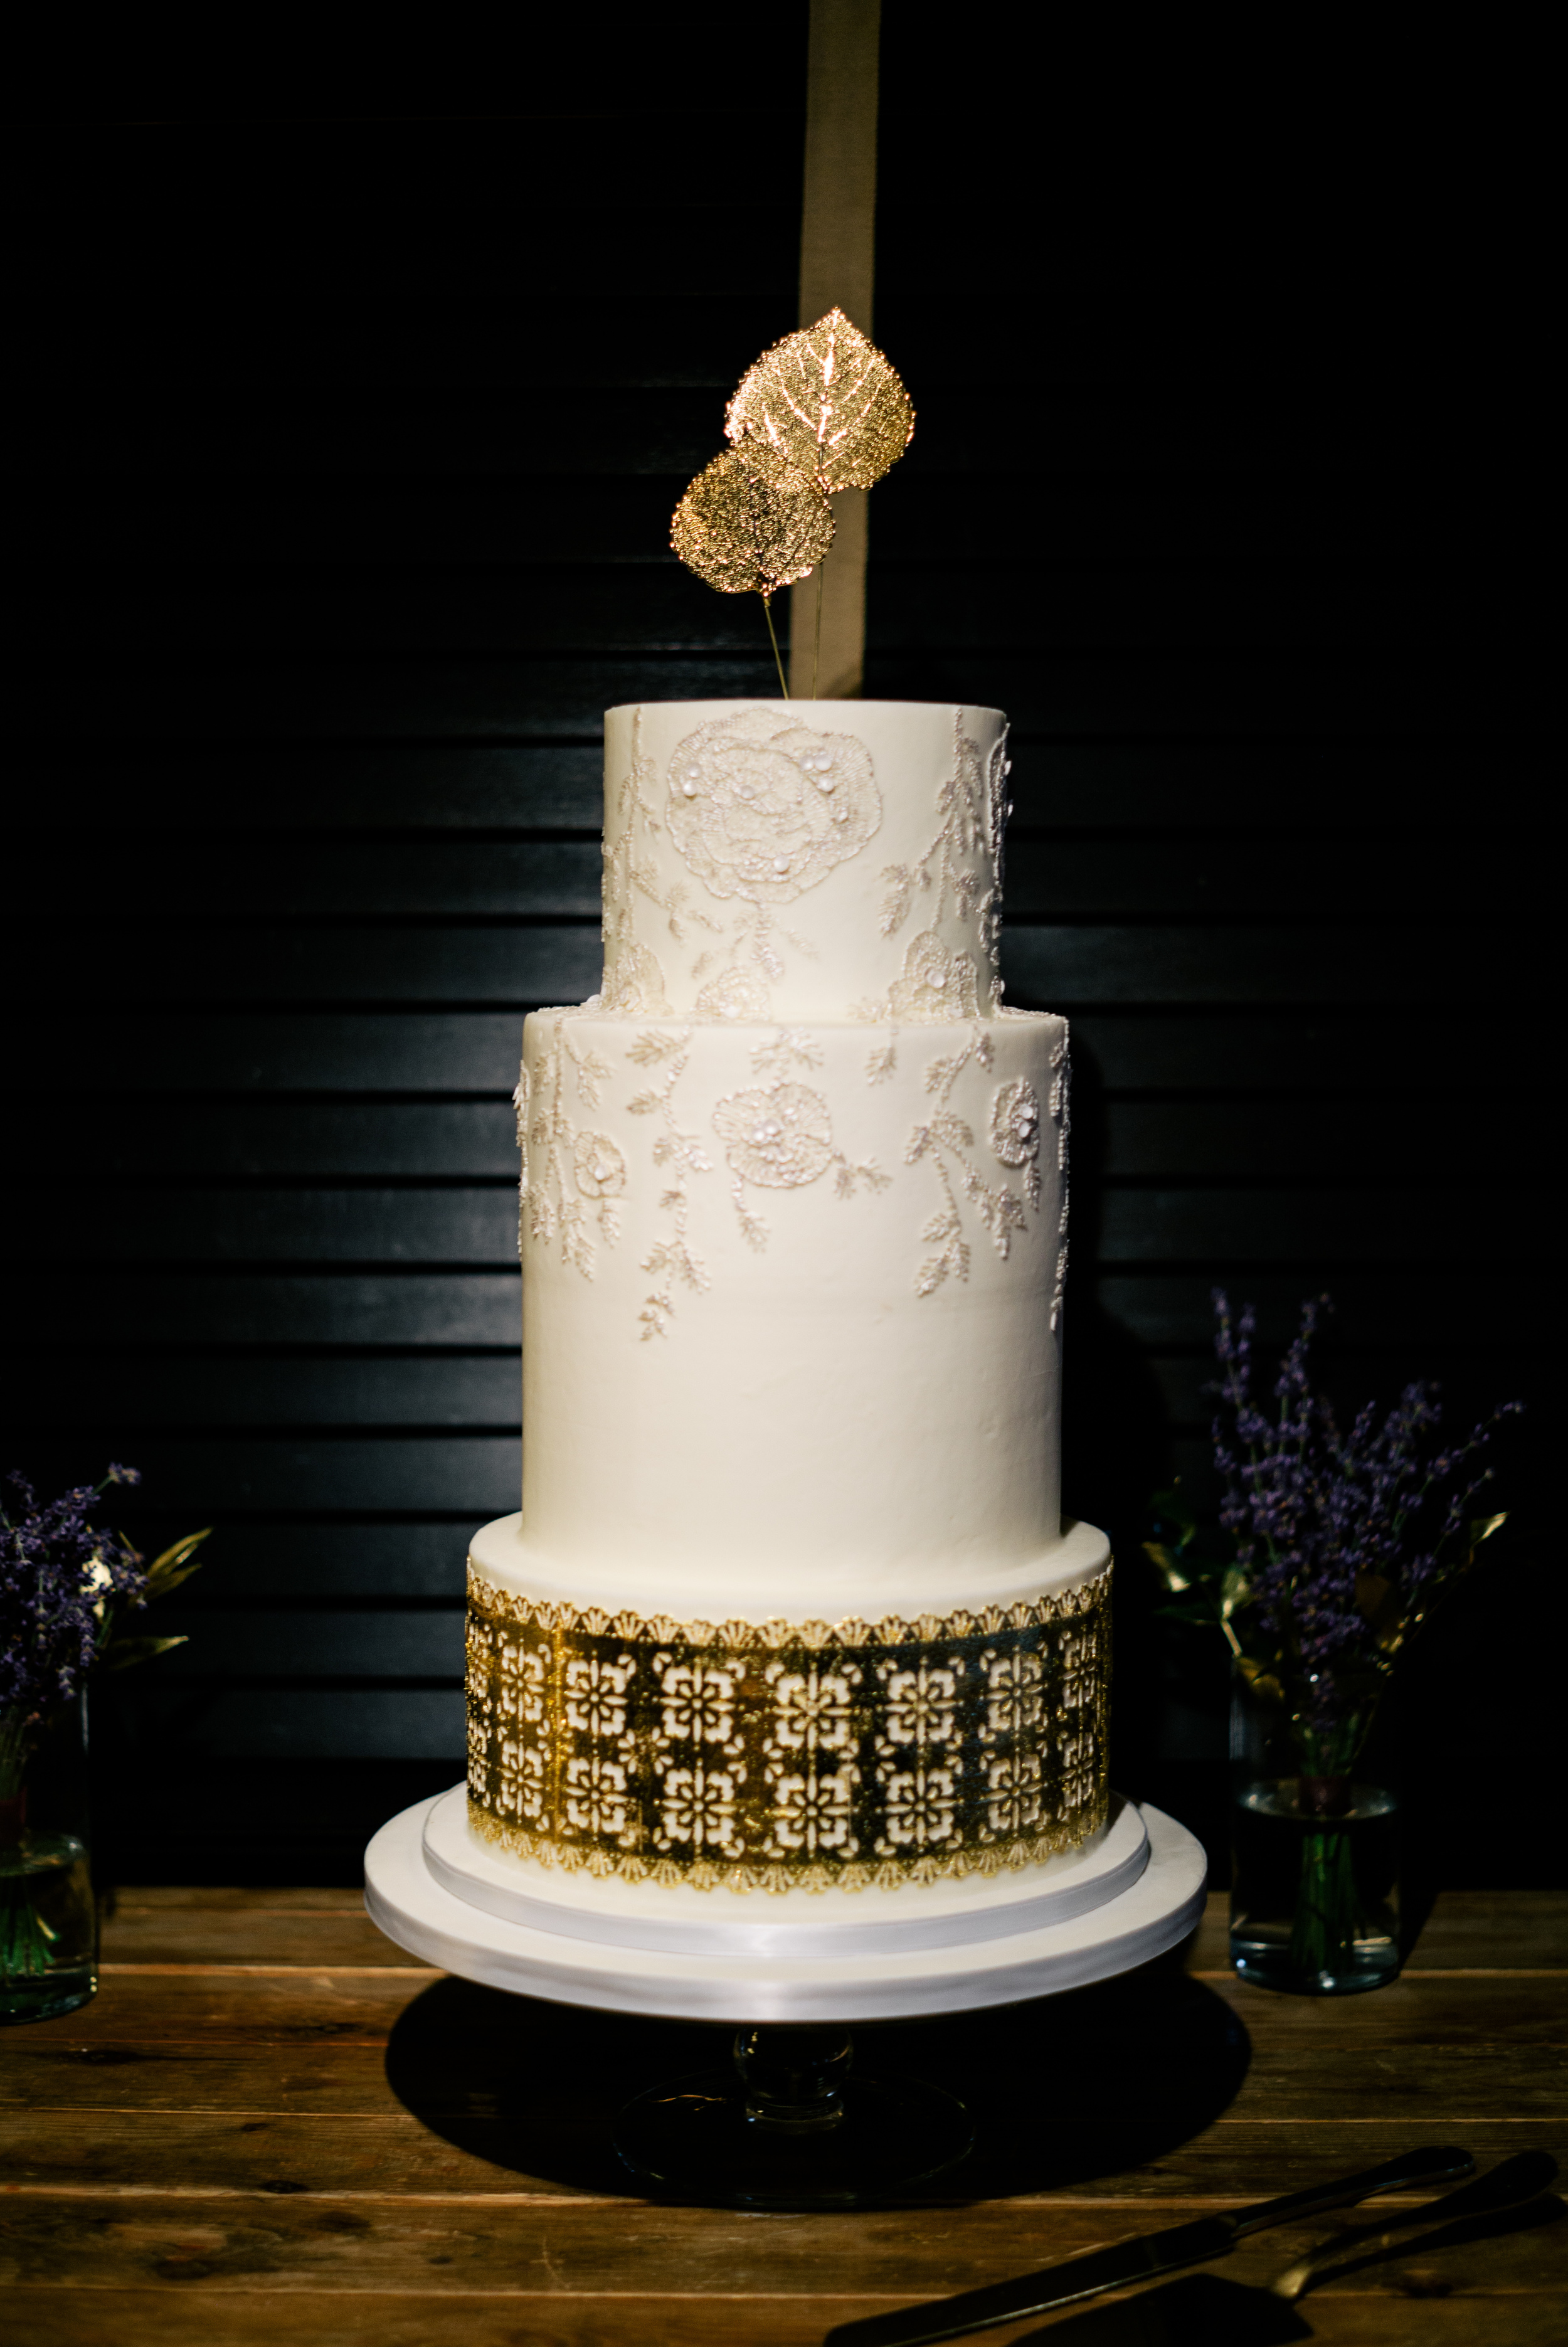 Kelly + Josh   Fall wedding at the Park Hyatt Beaver Creek   Cake by Intricate Icings   Ash Imagery